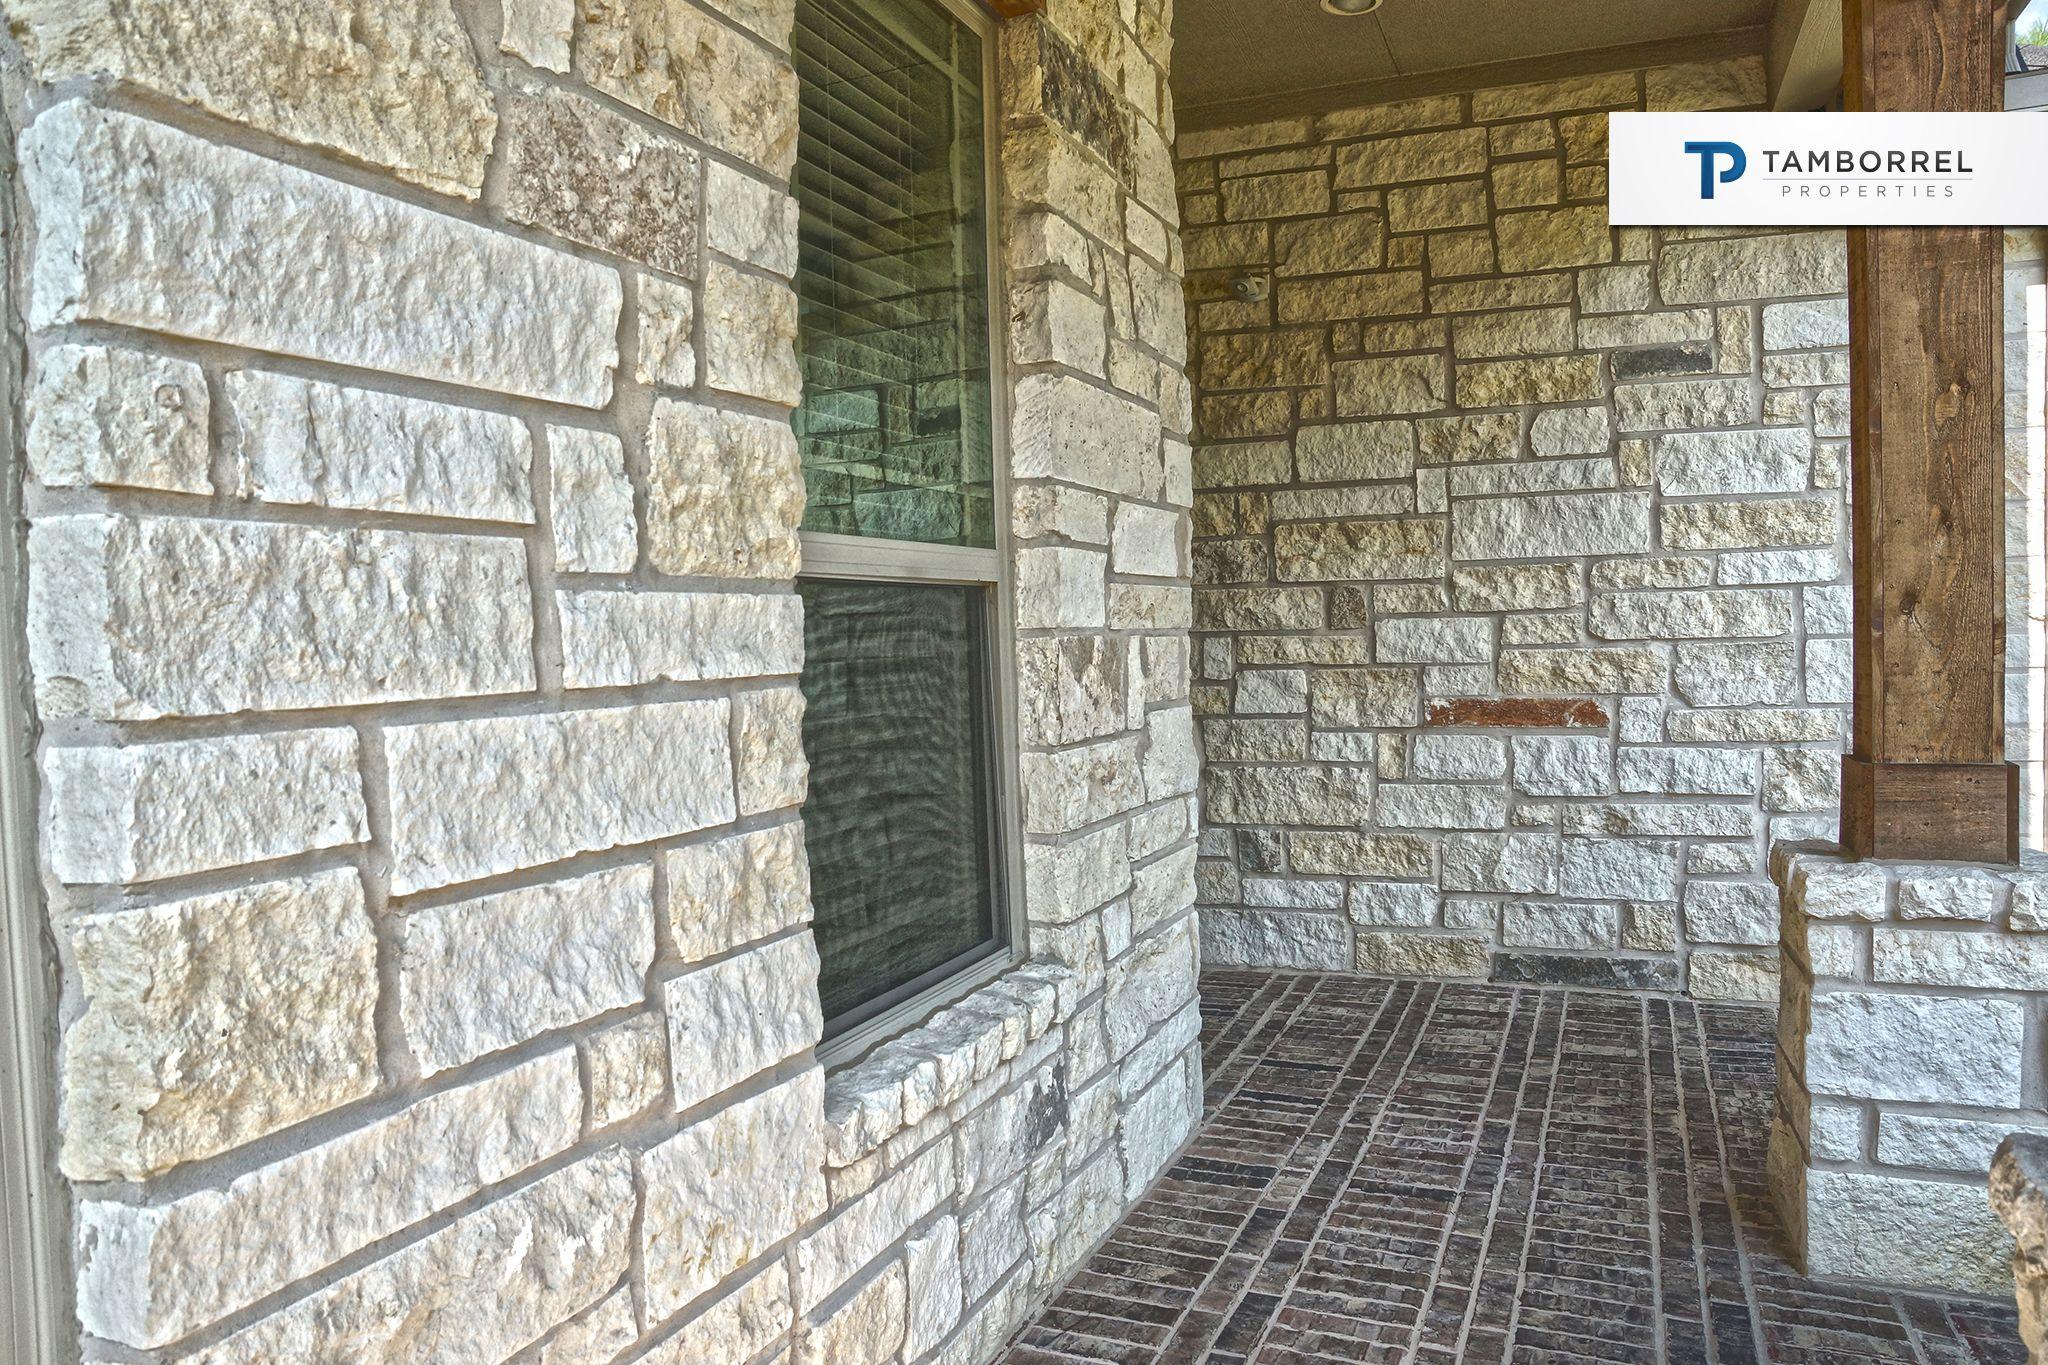 Las paredes est n pintadas de colores neutros d ndole a for Casa de azulejos